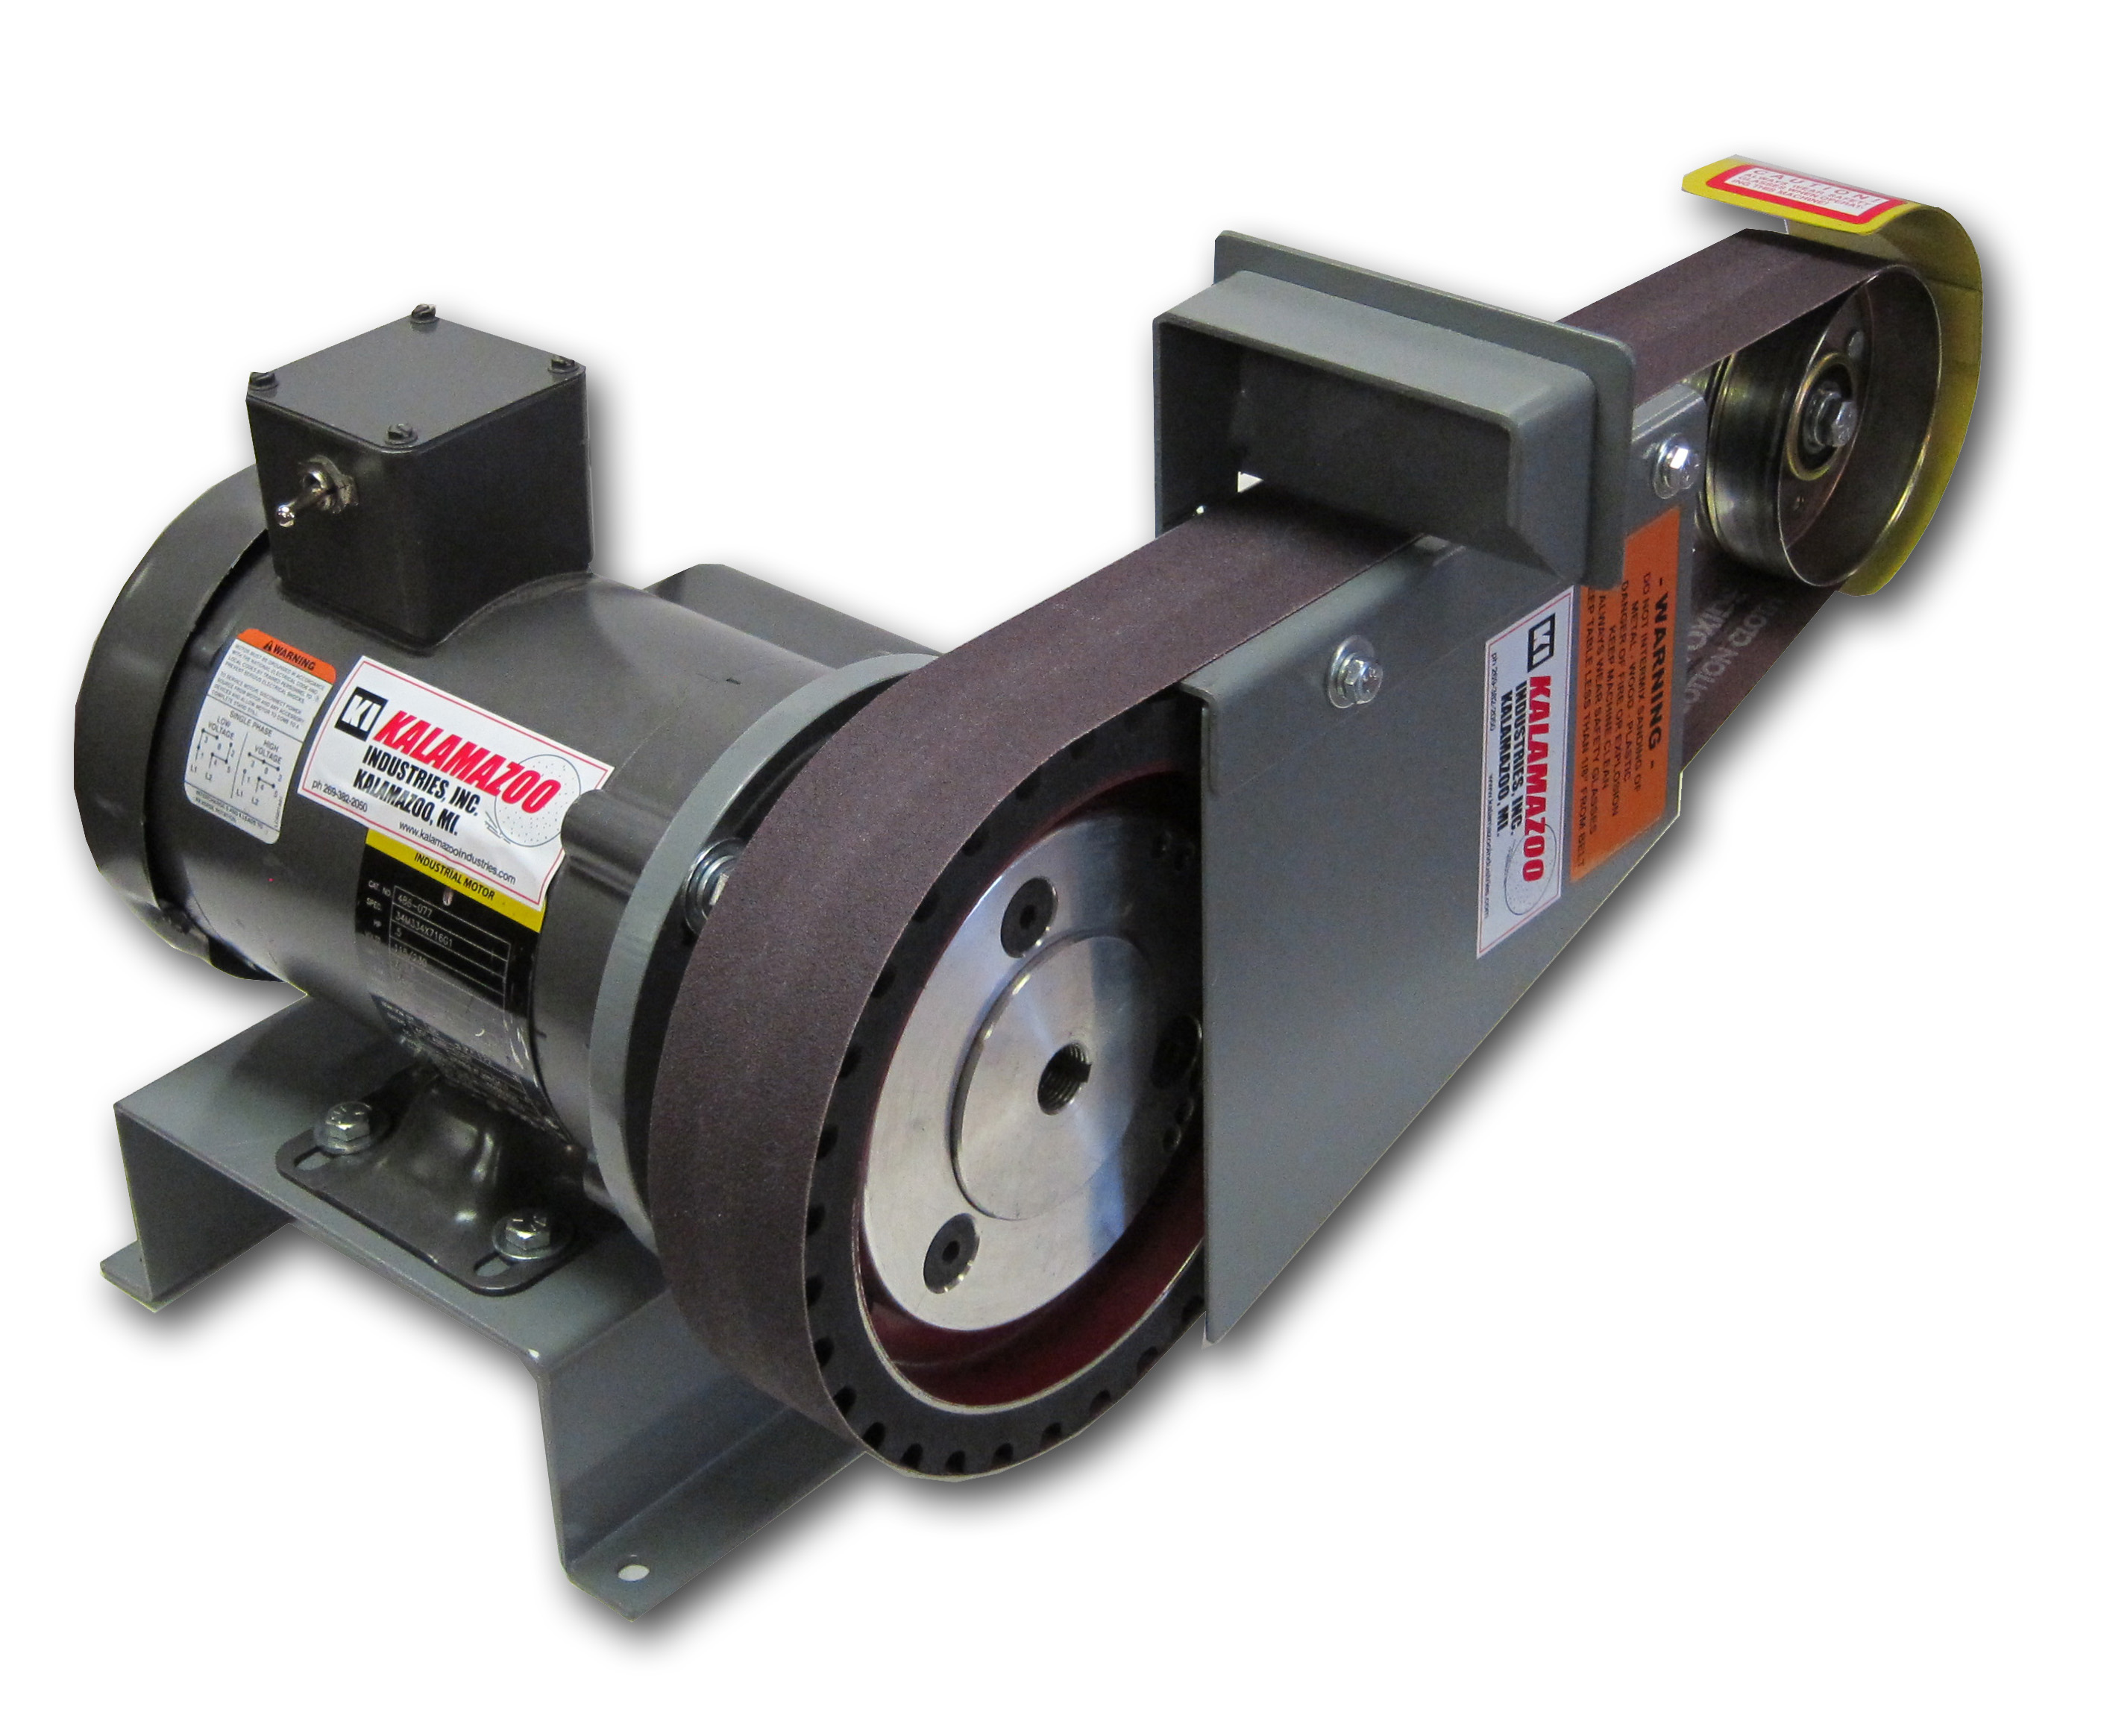 Kalamazoo Industries Bg248 2 X 48 Industrial Belt Grinder